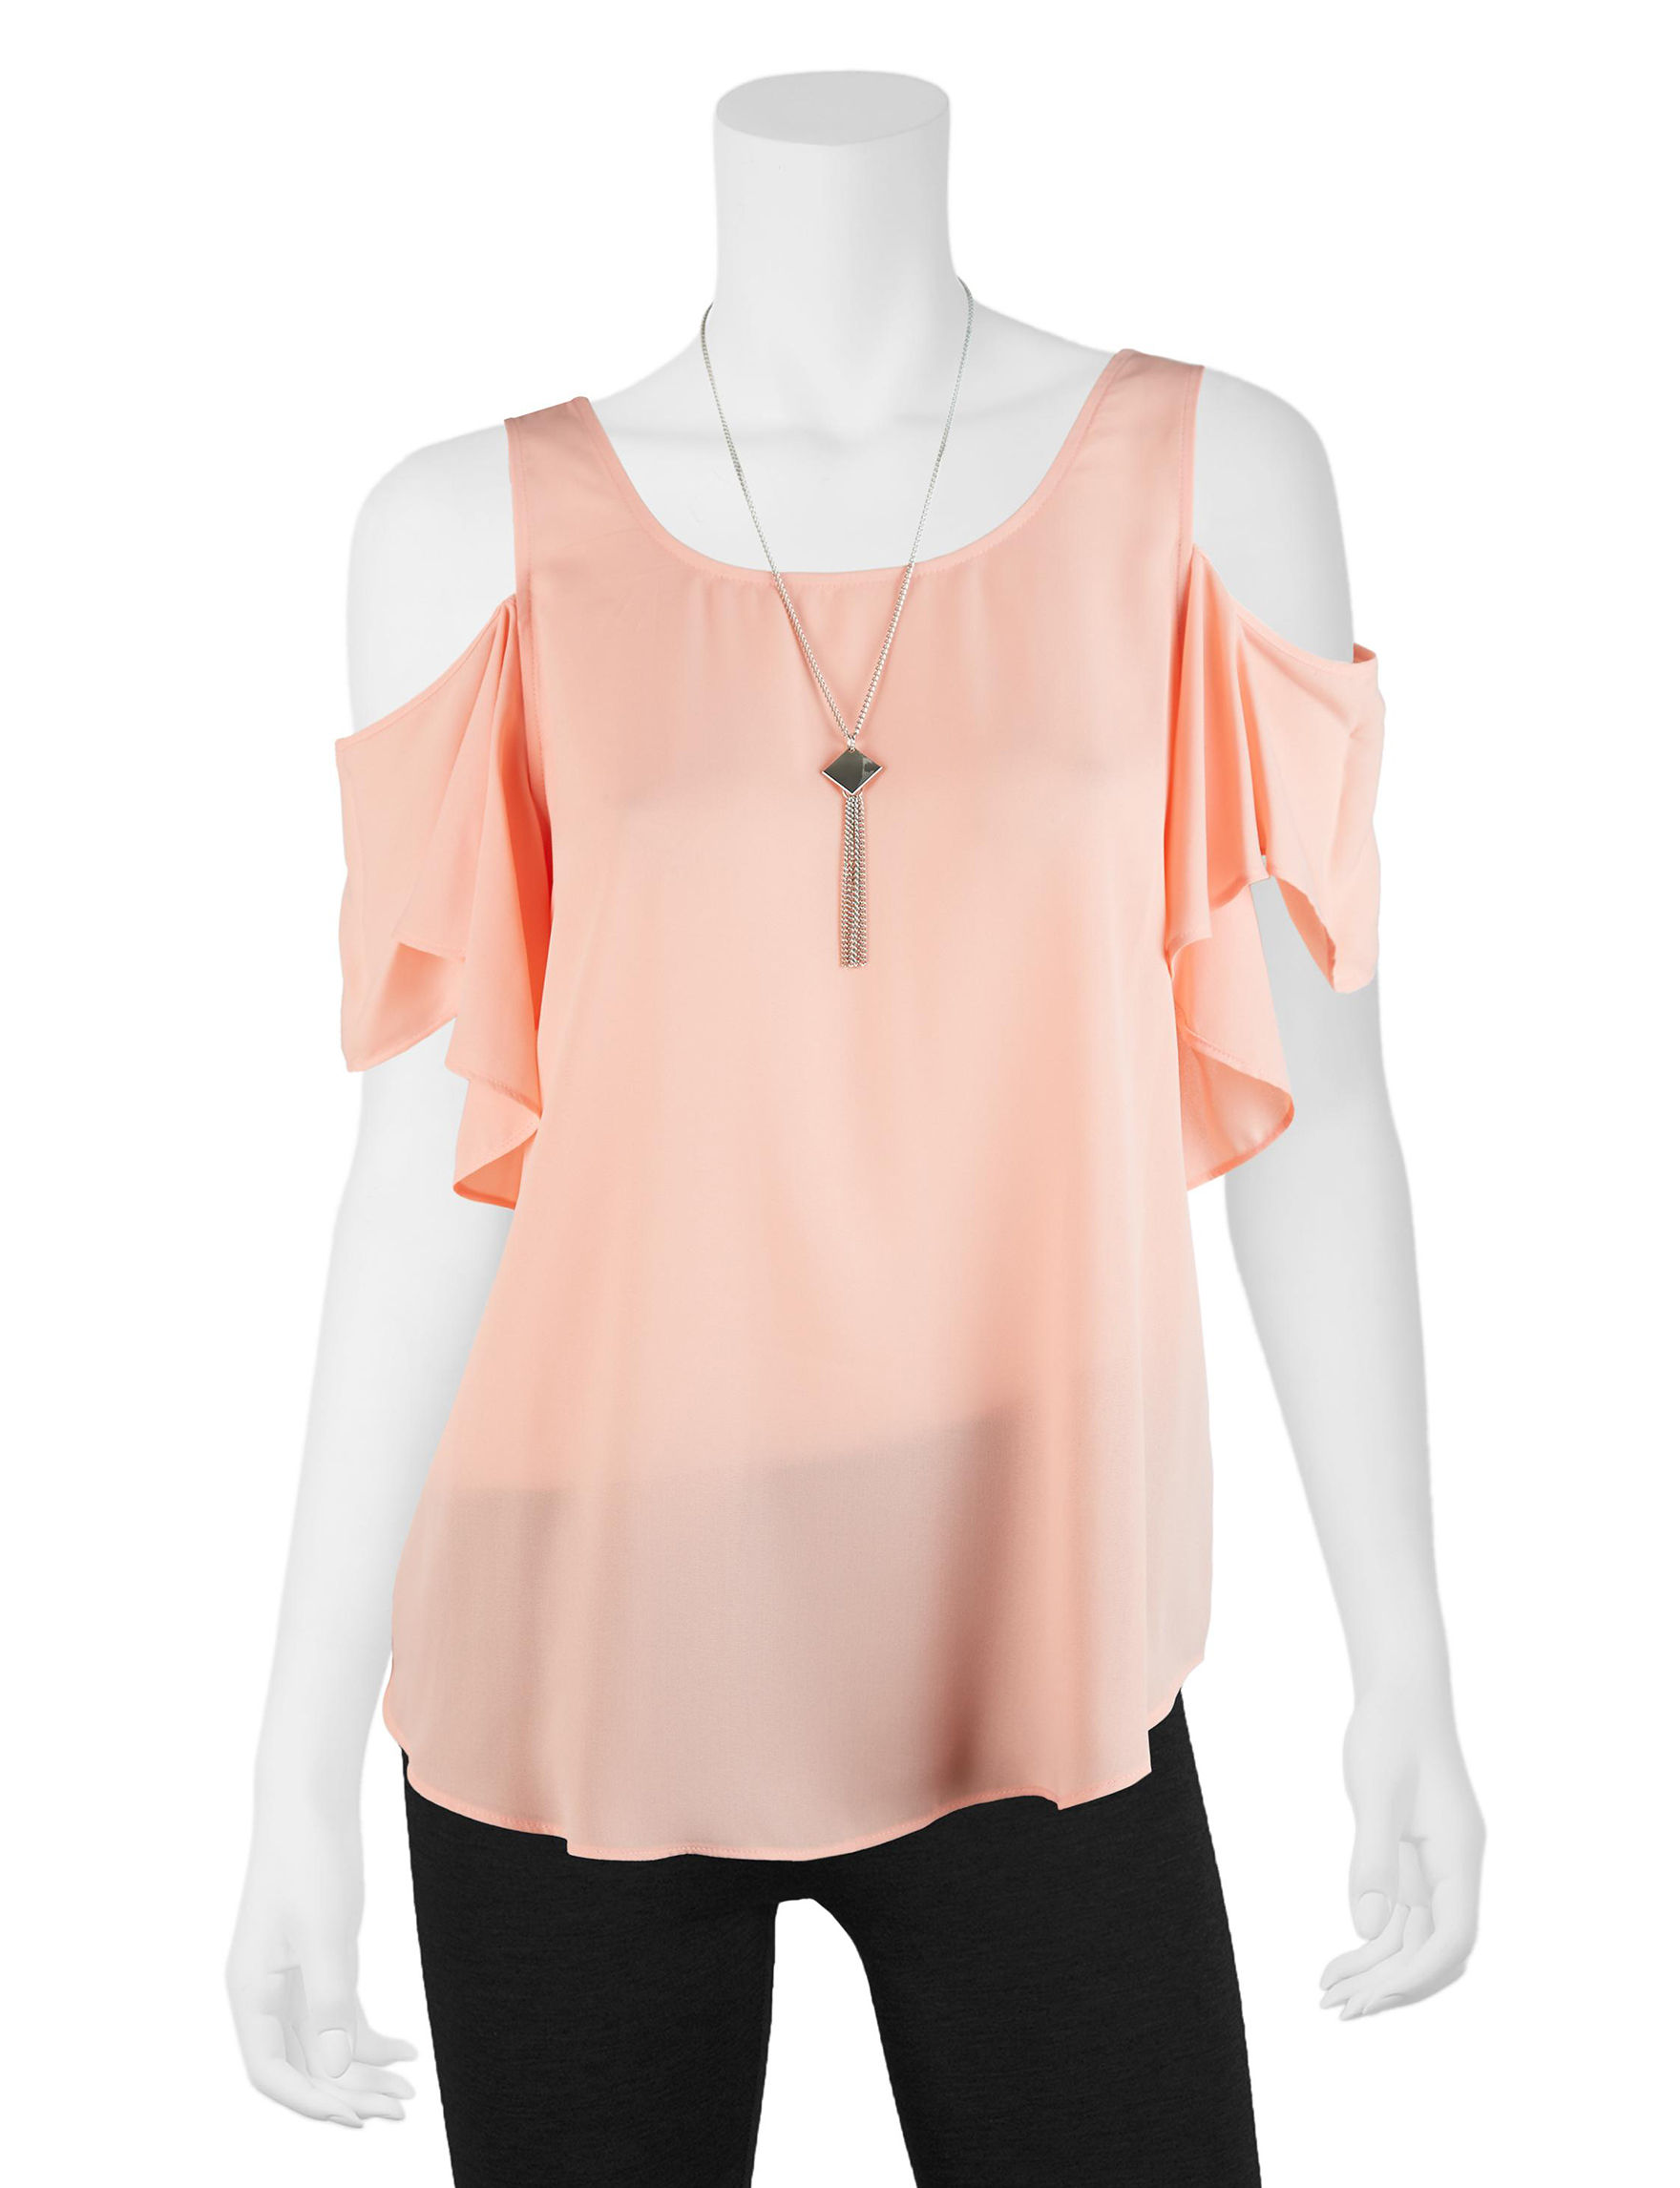 A. Byer Peach Shirts & Blouses